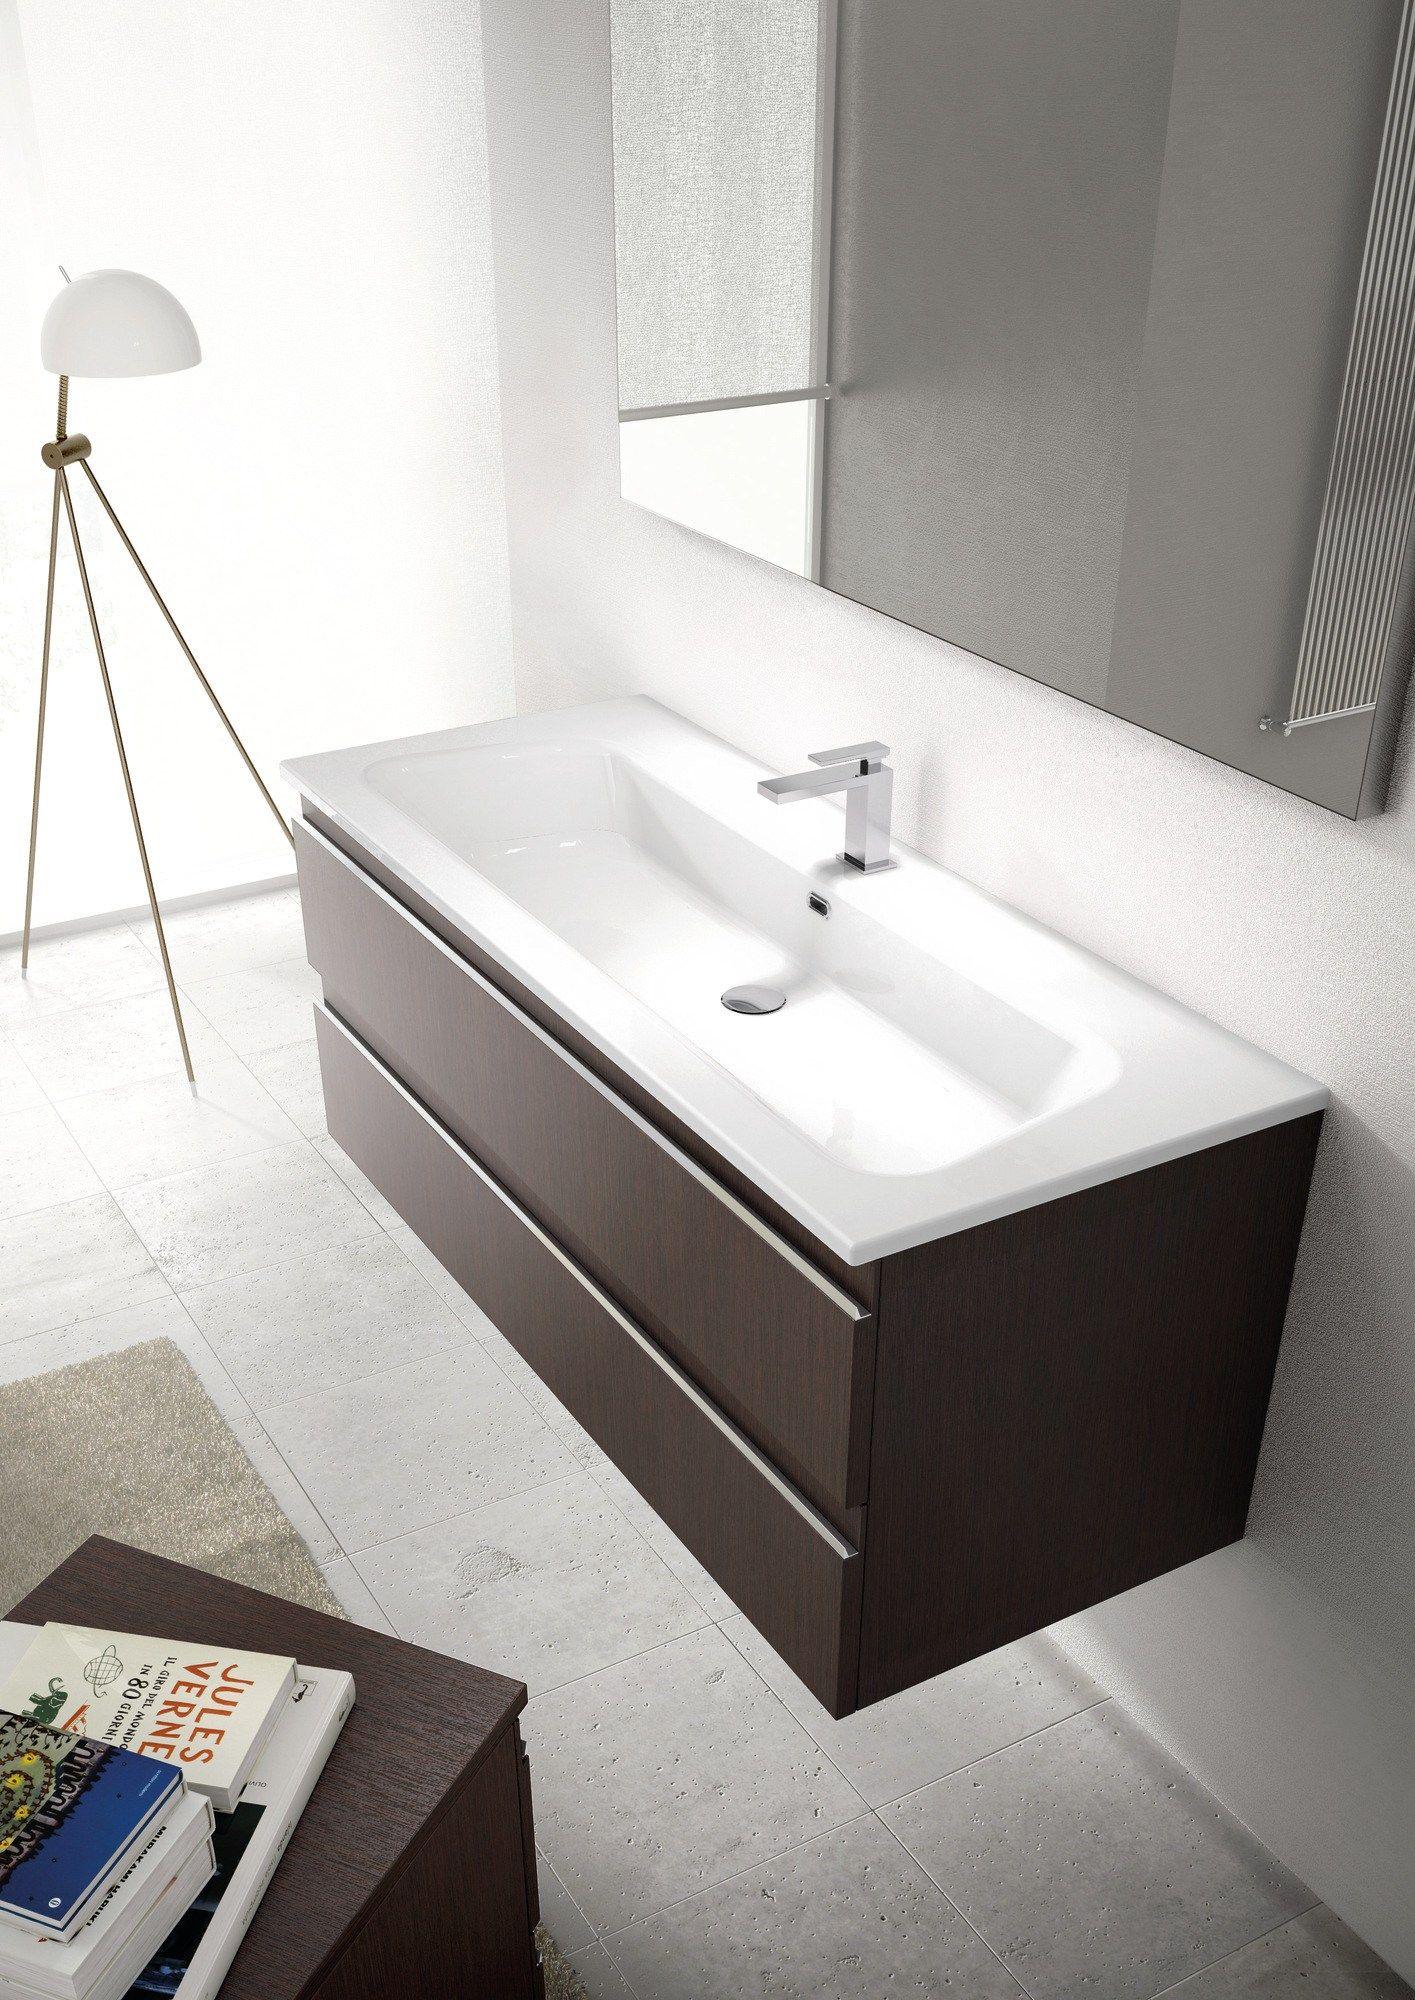 Arredo bagno completo mistral comp 06 by ideagroup for Arredo bagno completo